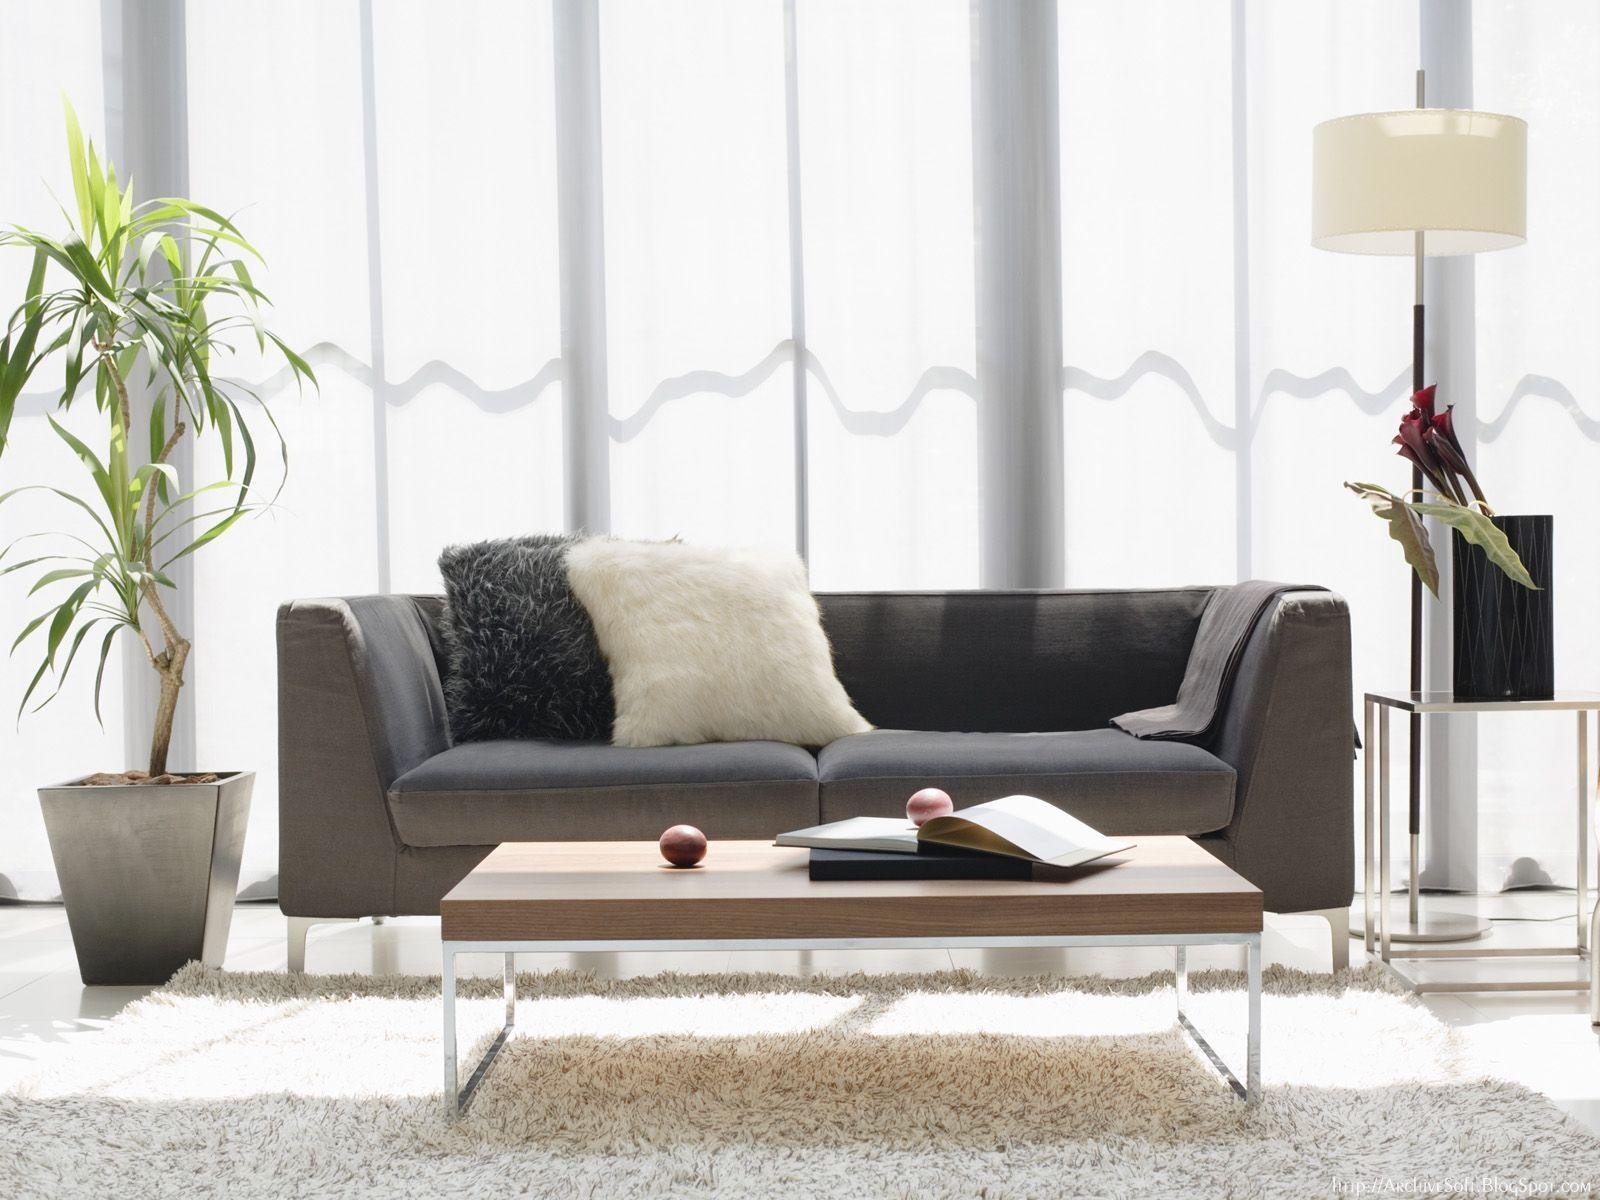 Home Design Diseño Para El Hogar Home Design Conception De Maison Home  Design Home Design Reka